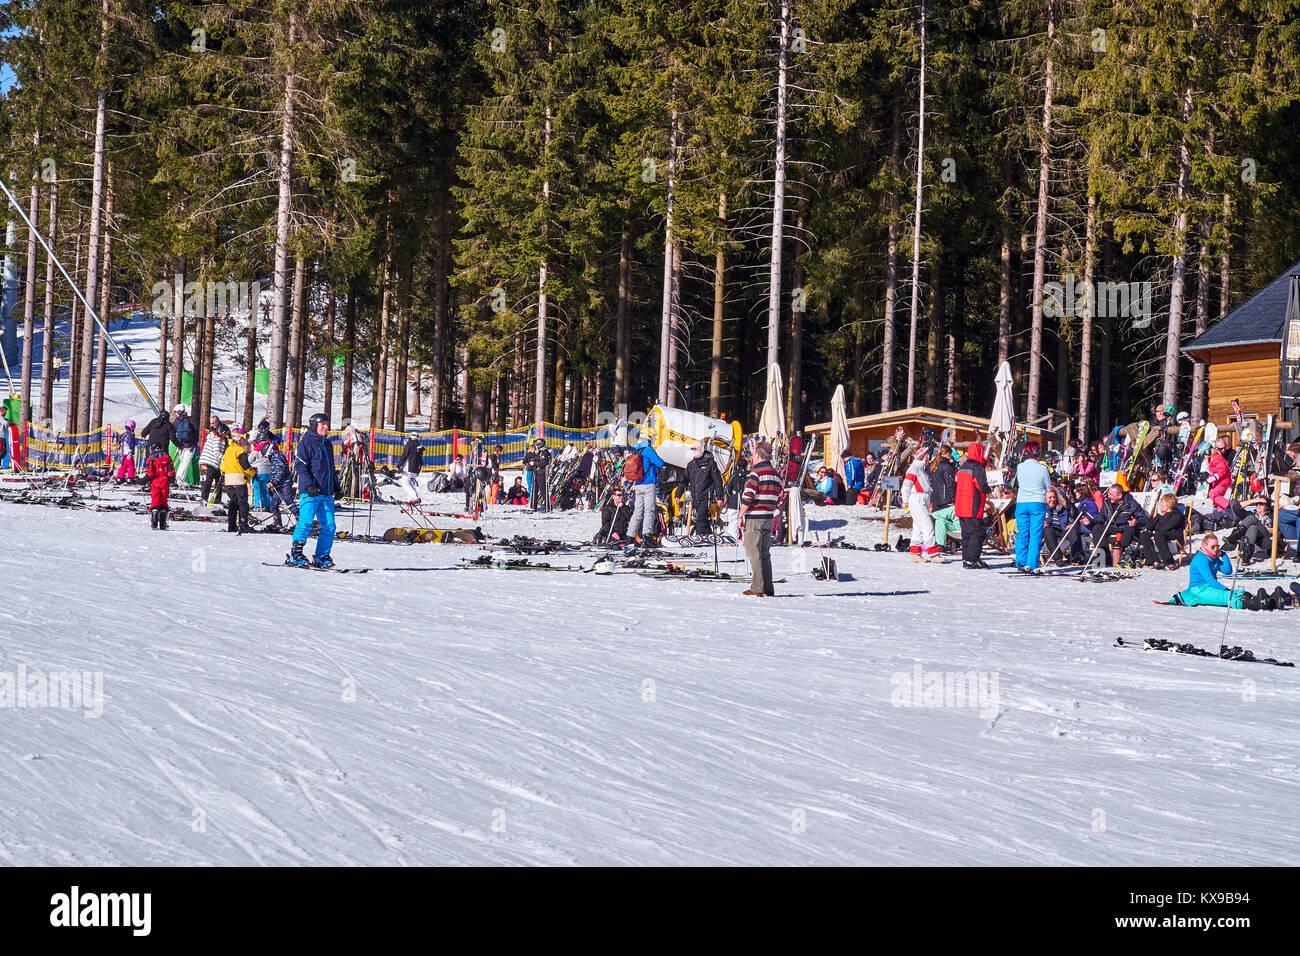 WINTERBERG, GERMANY - FEBRUARY 15, 2017: Large group of people taking a break at Ski Carousel Winterberg - Stock Image